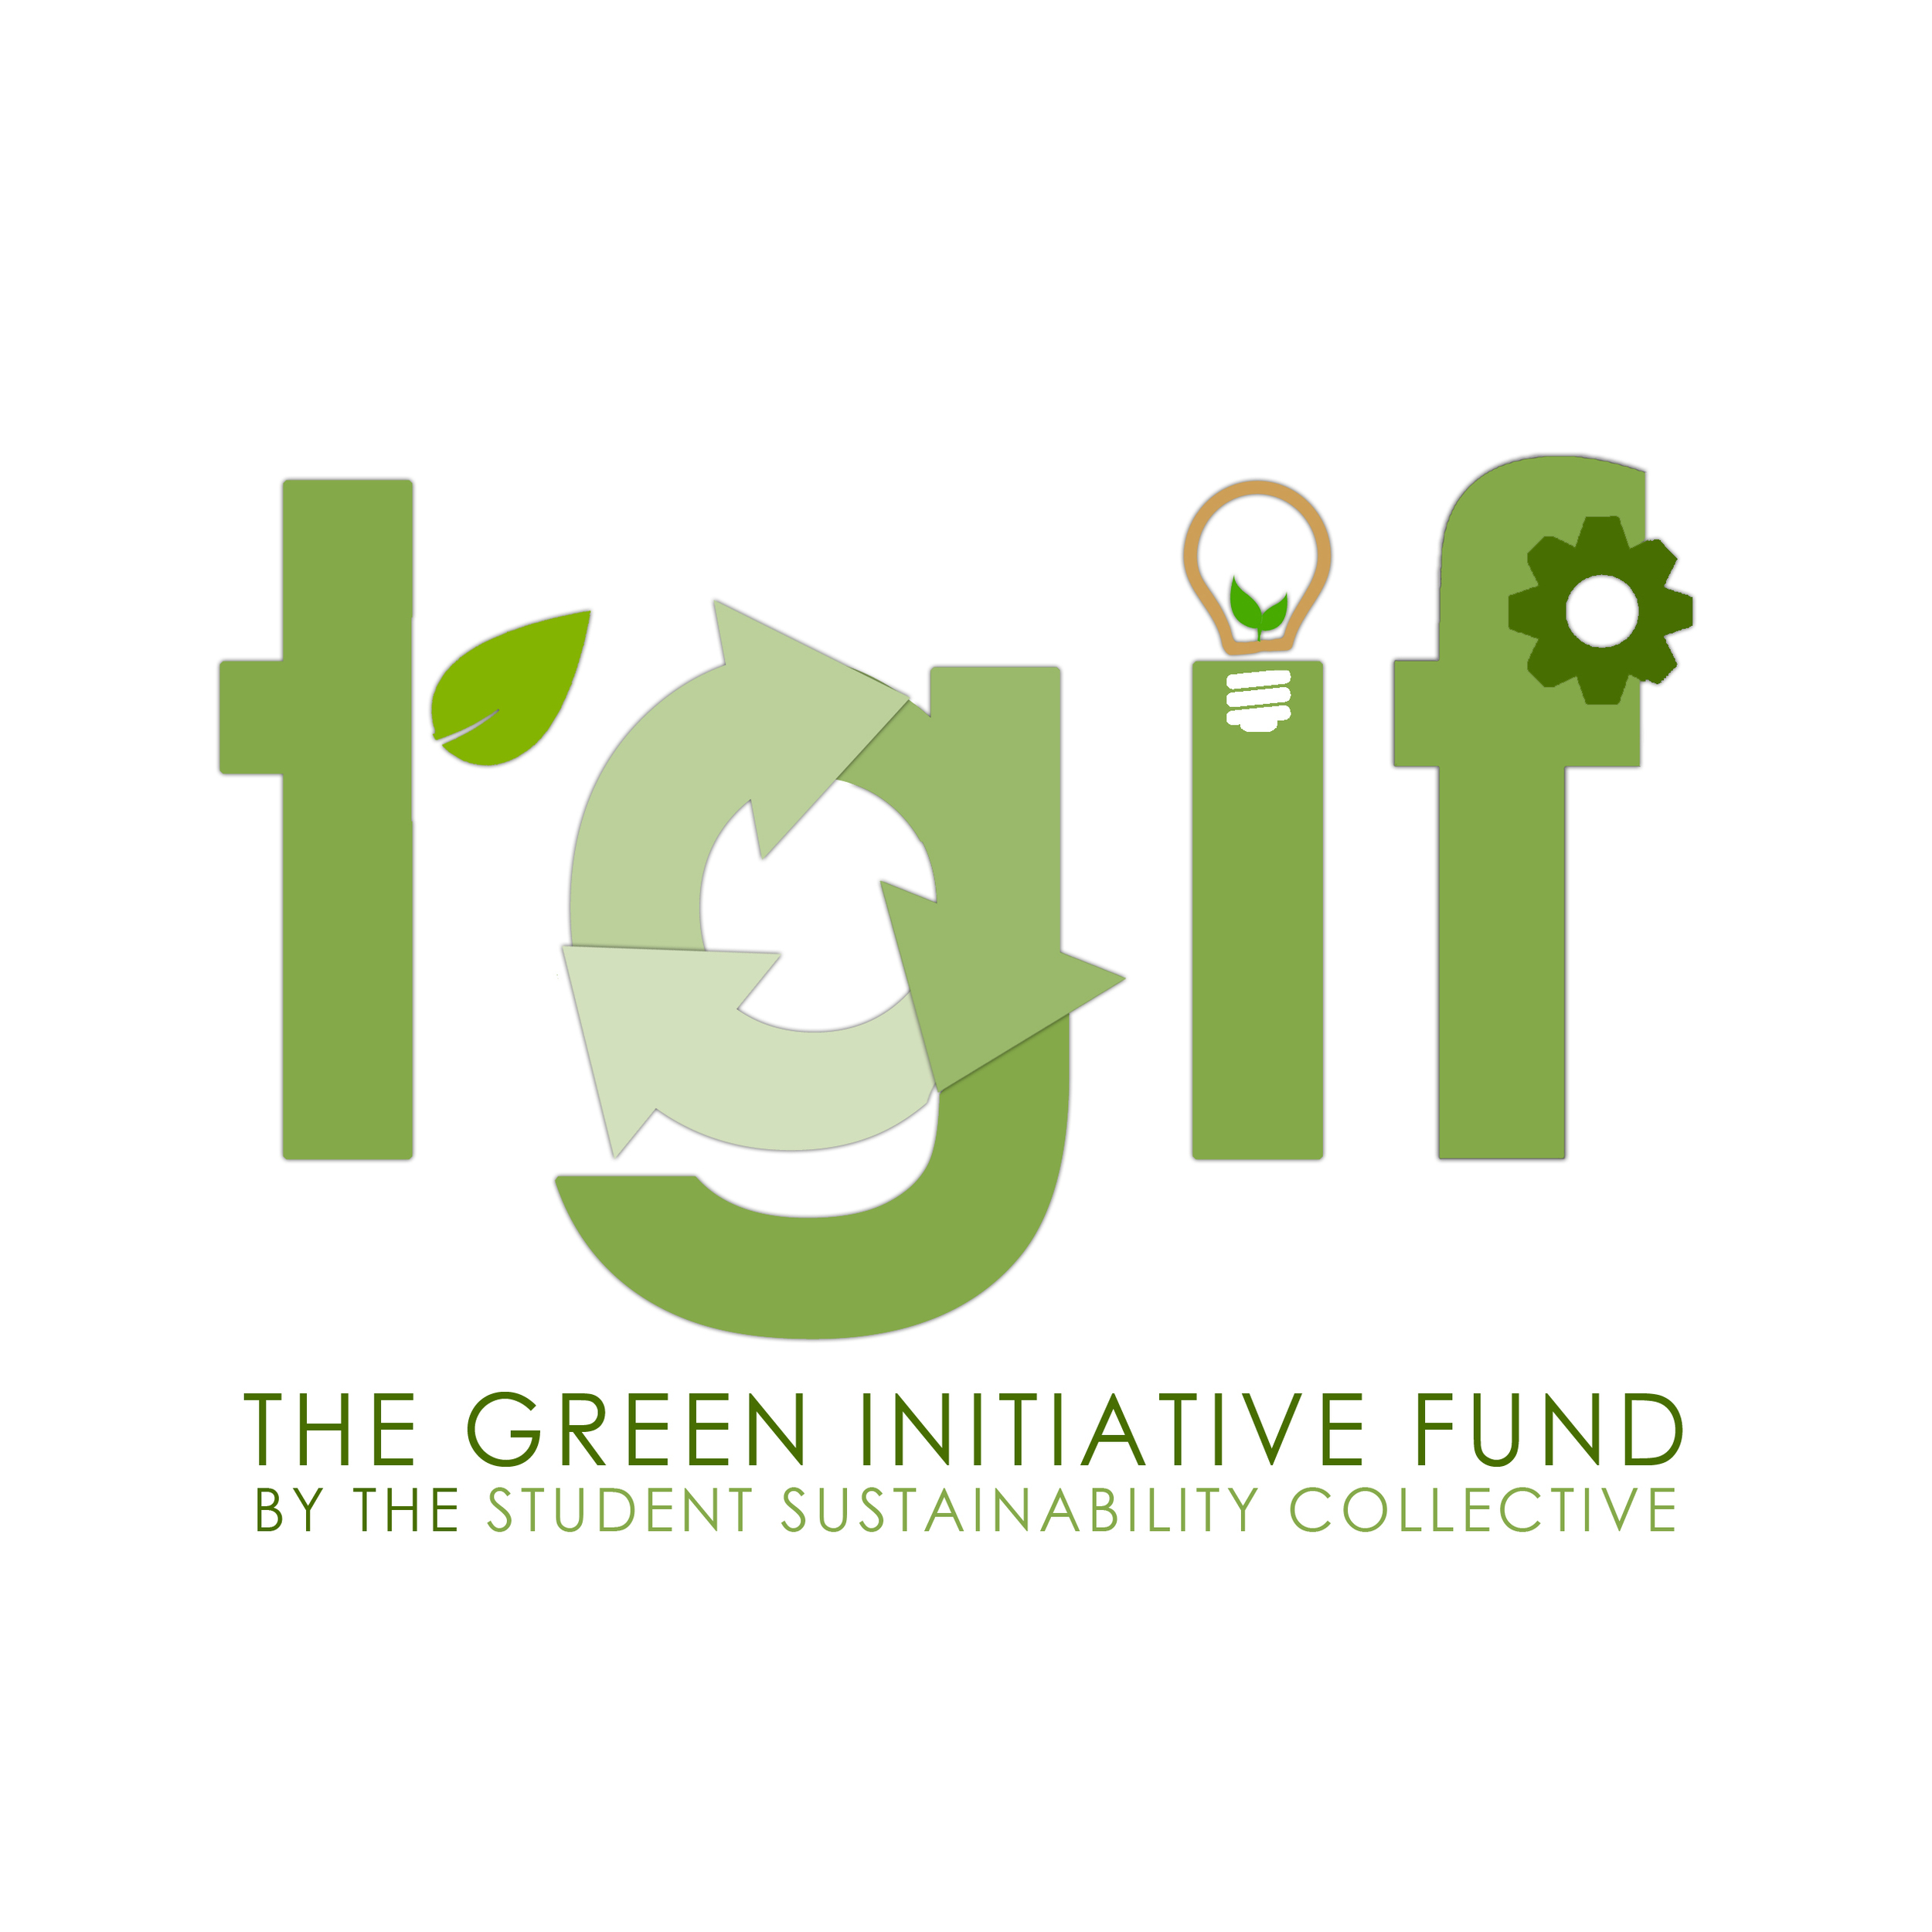 tgif_new_logo.jpg